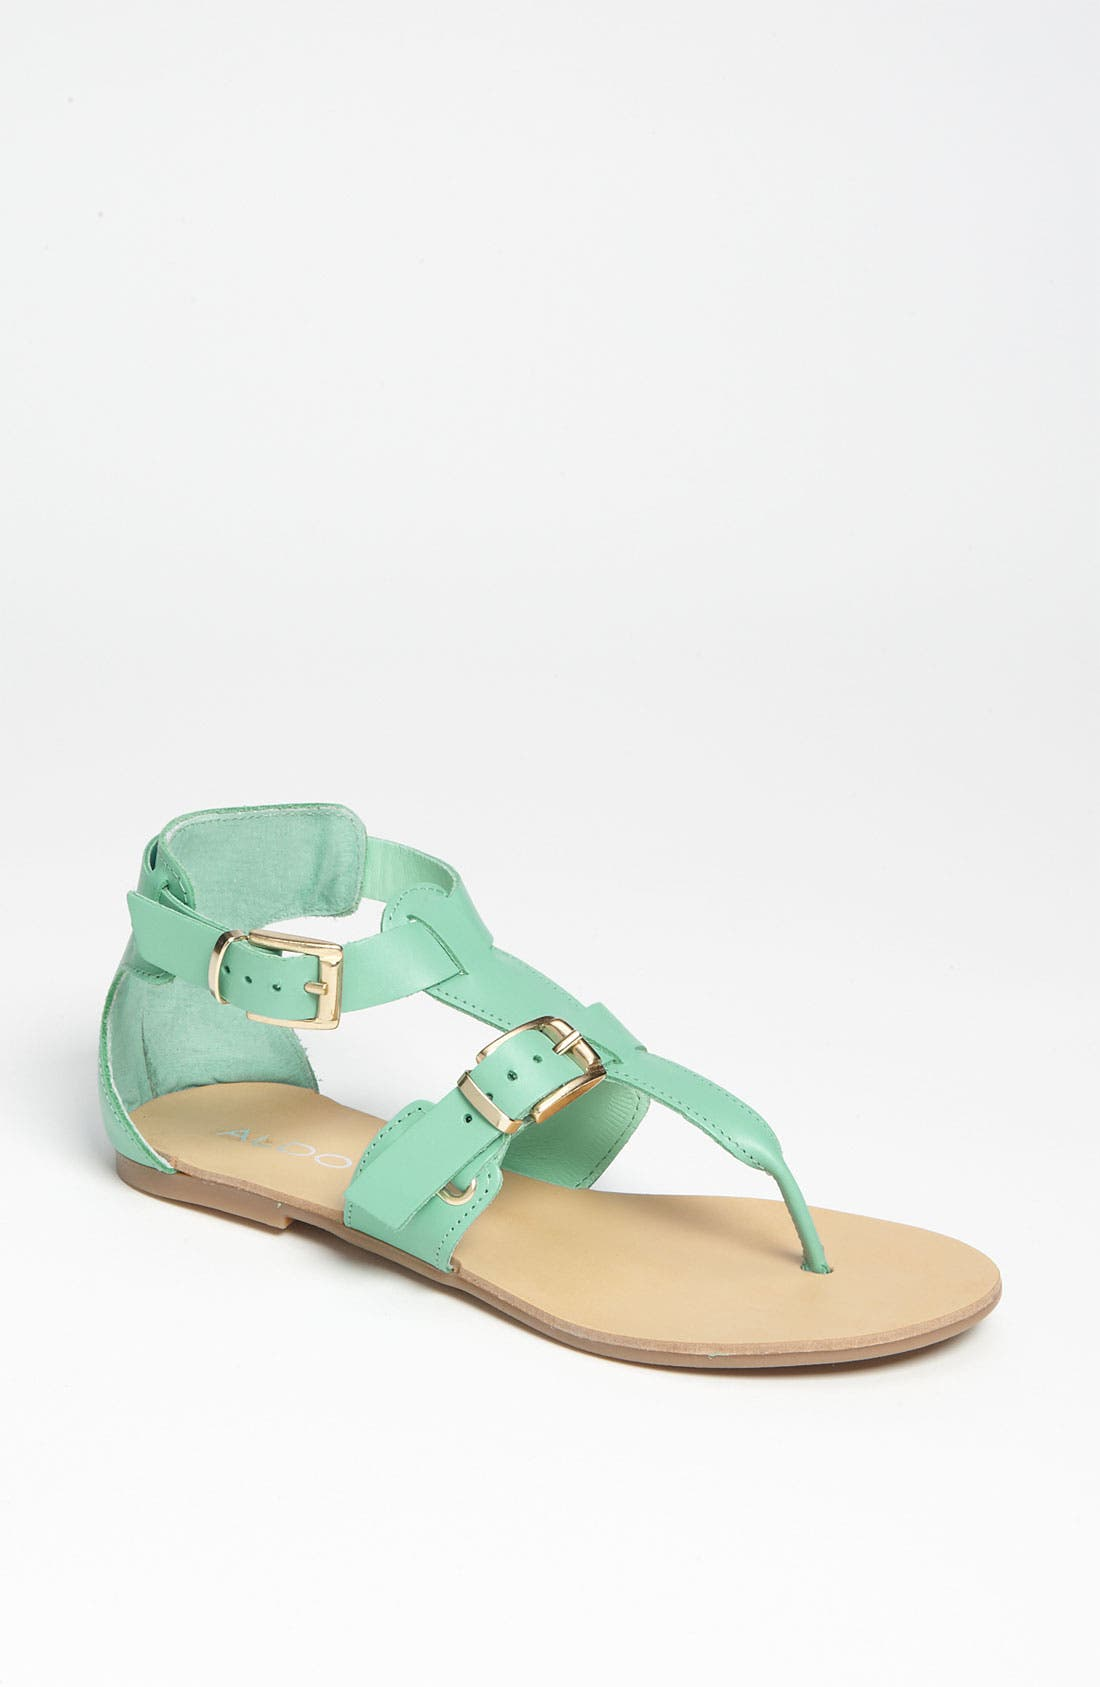 Alternate Image 1 Selected - ALDO 'Tossie' Sandal